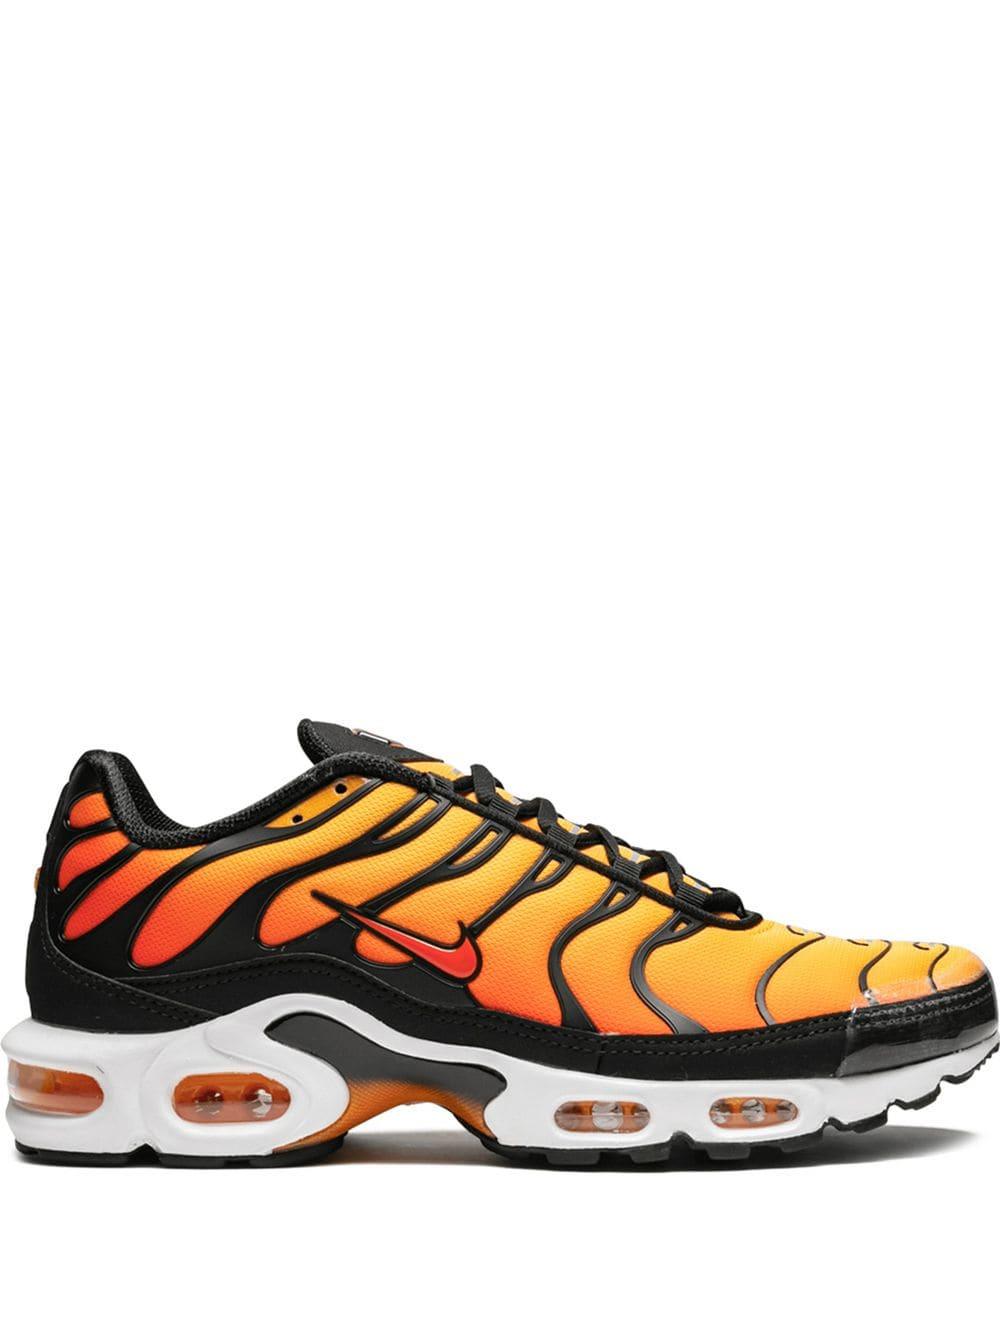 Nike Air Max Plus OG sneakers Orange | Products in 2019